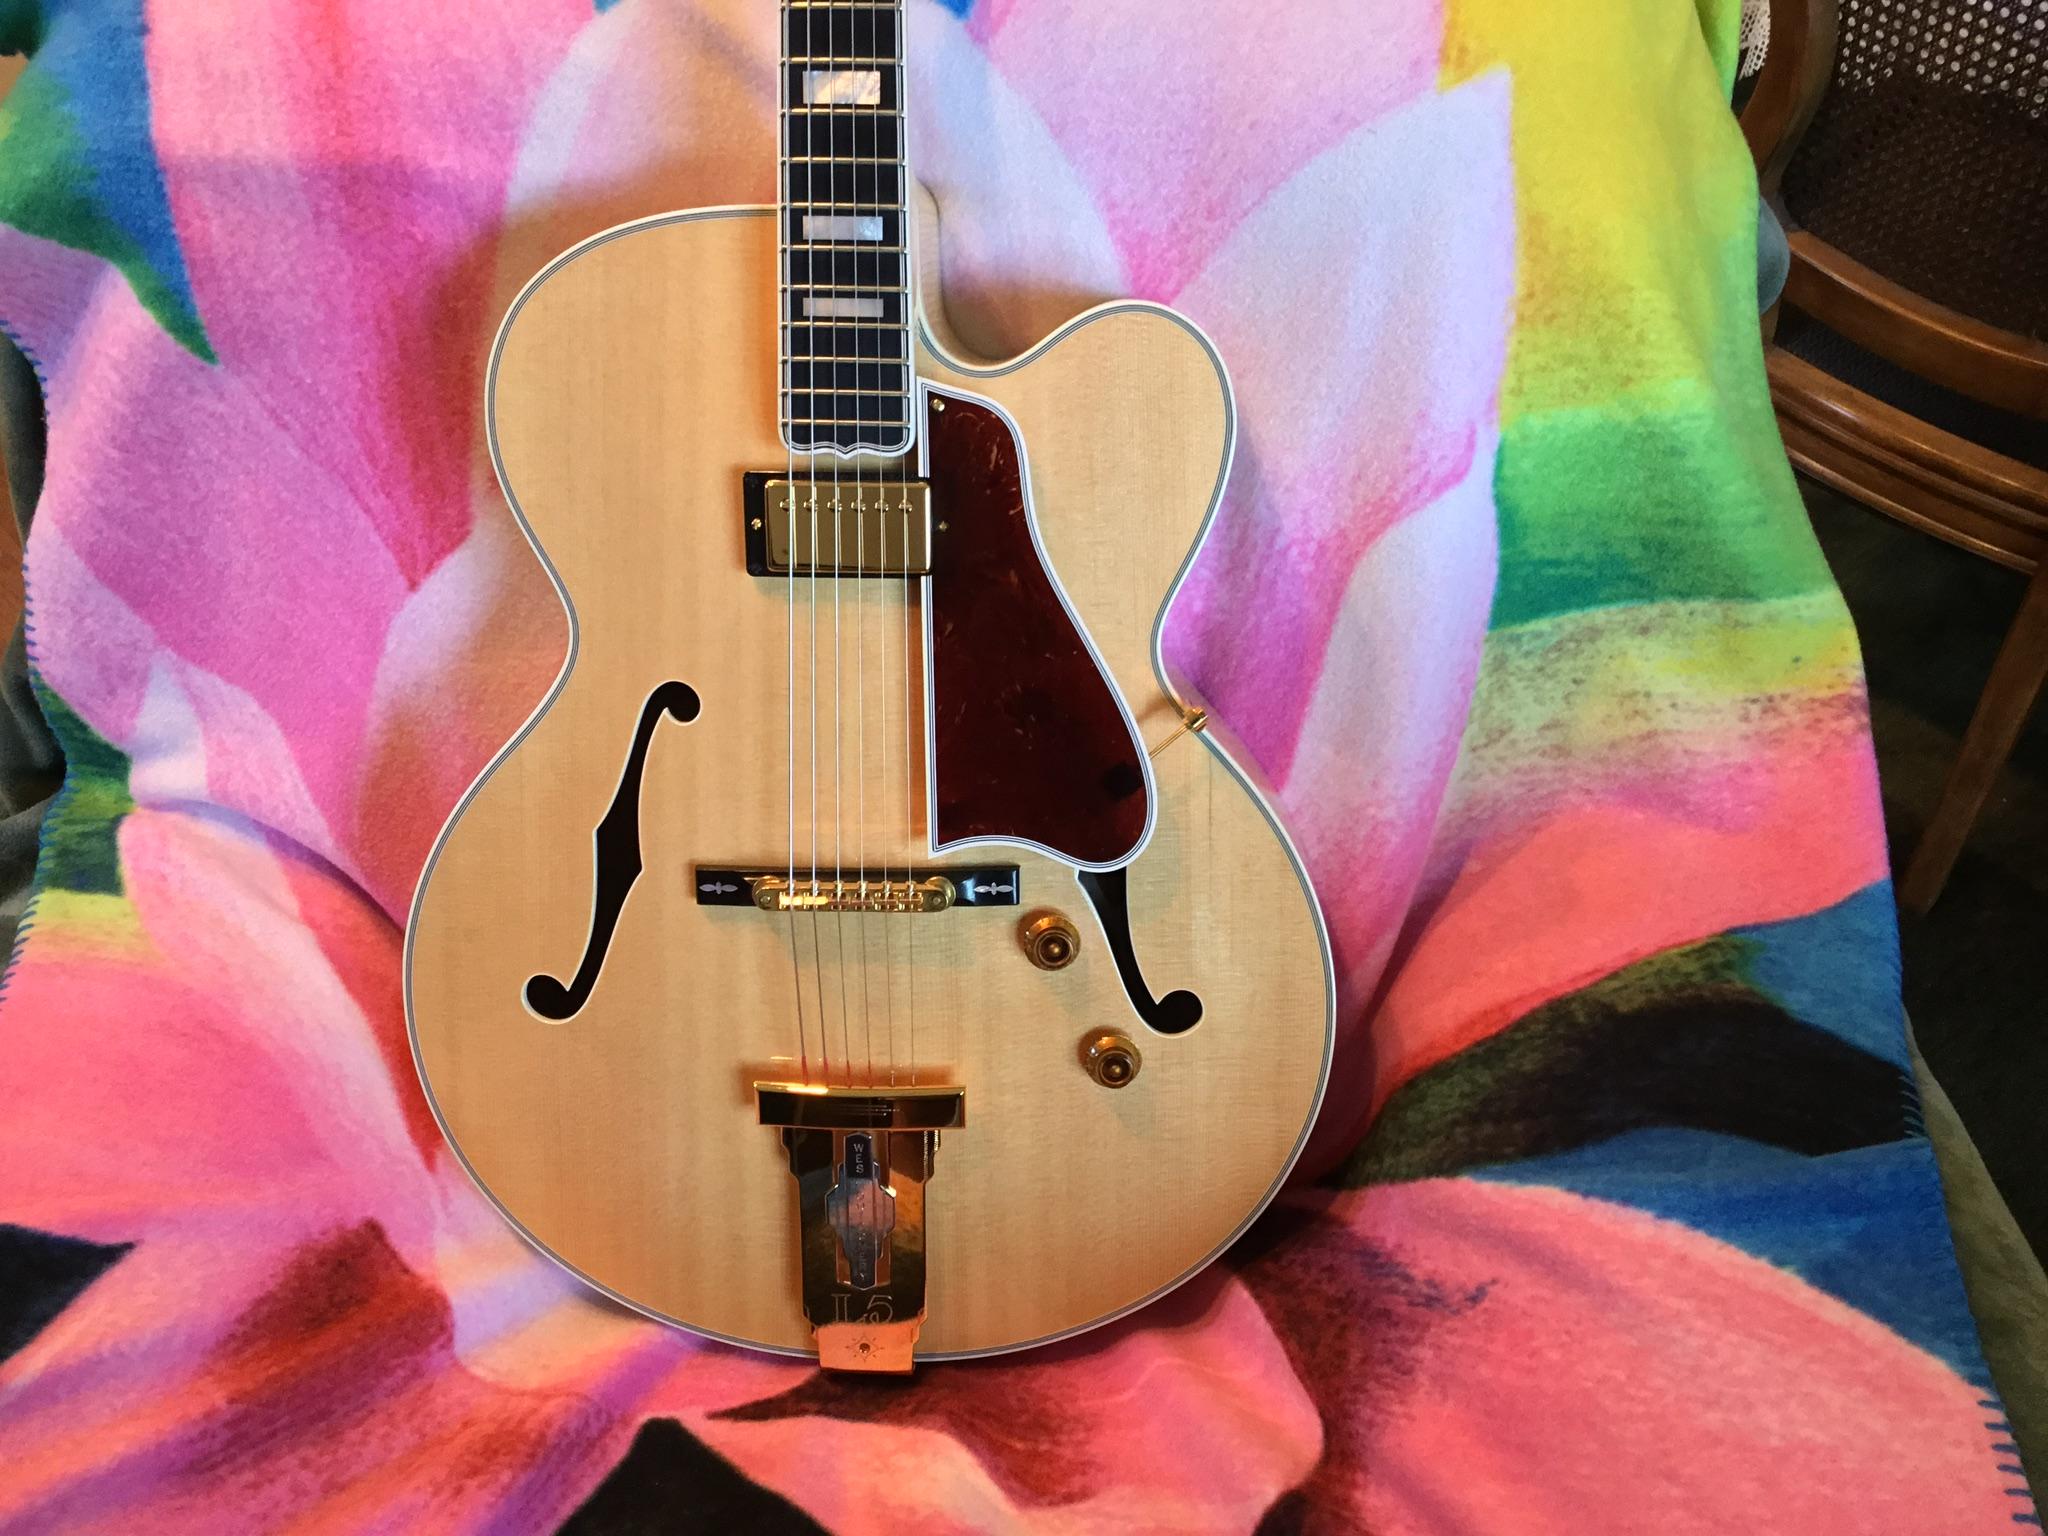 Dream guitar buying issues-6cc5c5c8-3036-4868-8268-ebb82cced8d2-jpeg